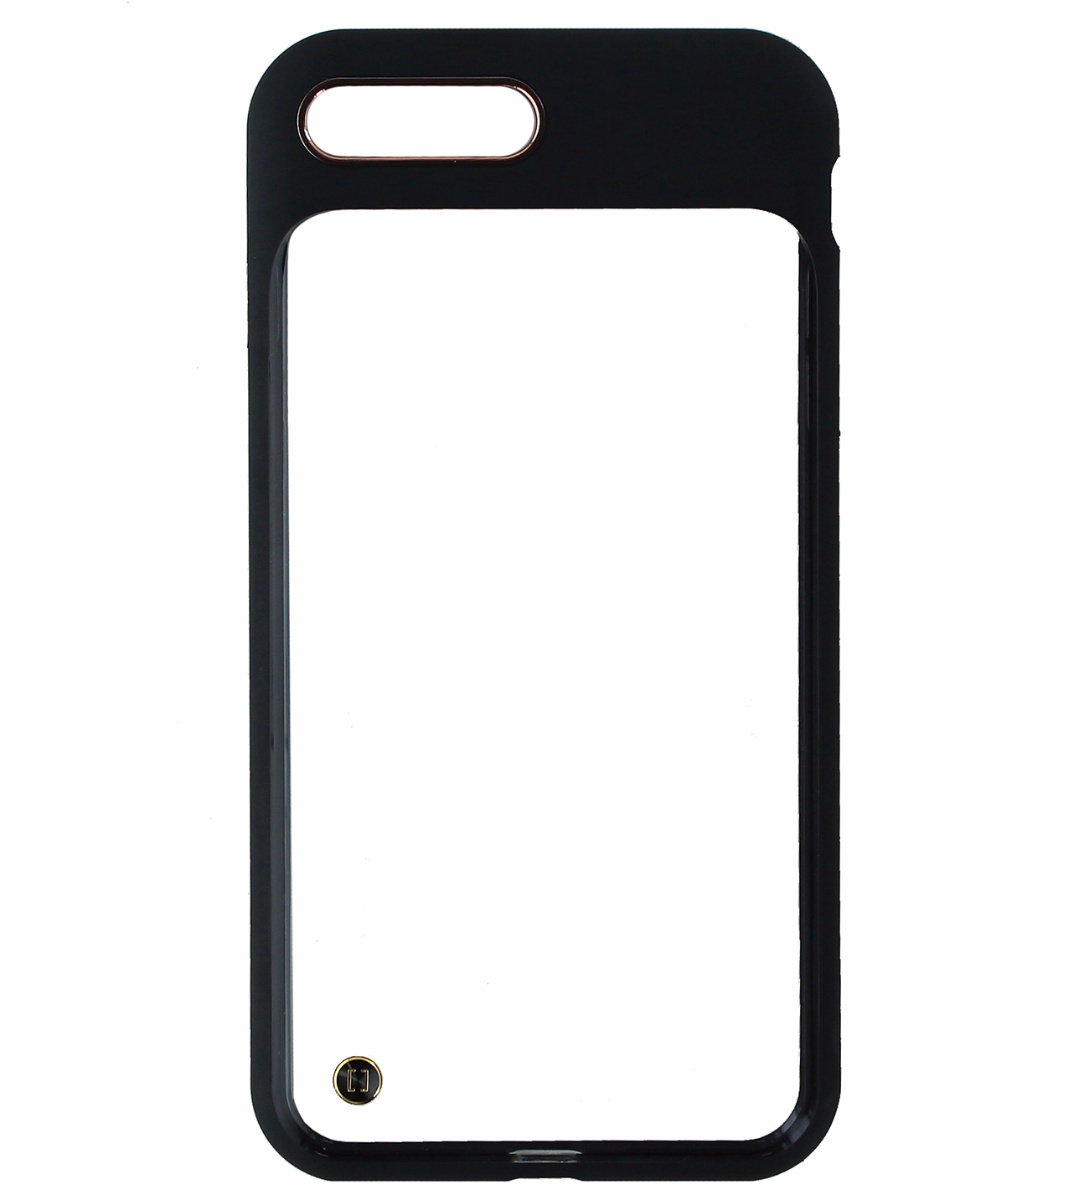 Granite Mono Series Hybrid Case Cover iPhone 8 Plus / 7 Plus - Clear / Black